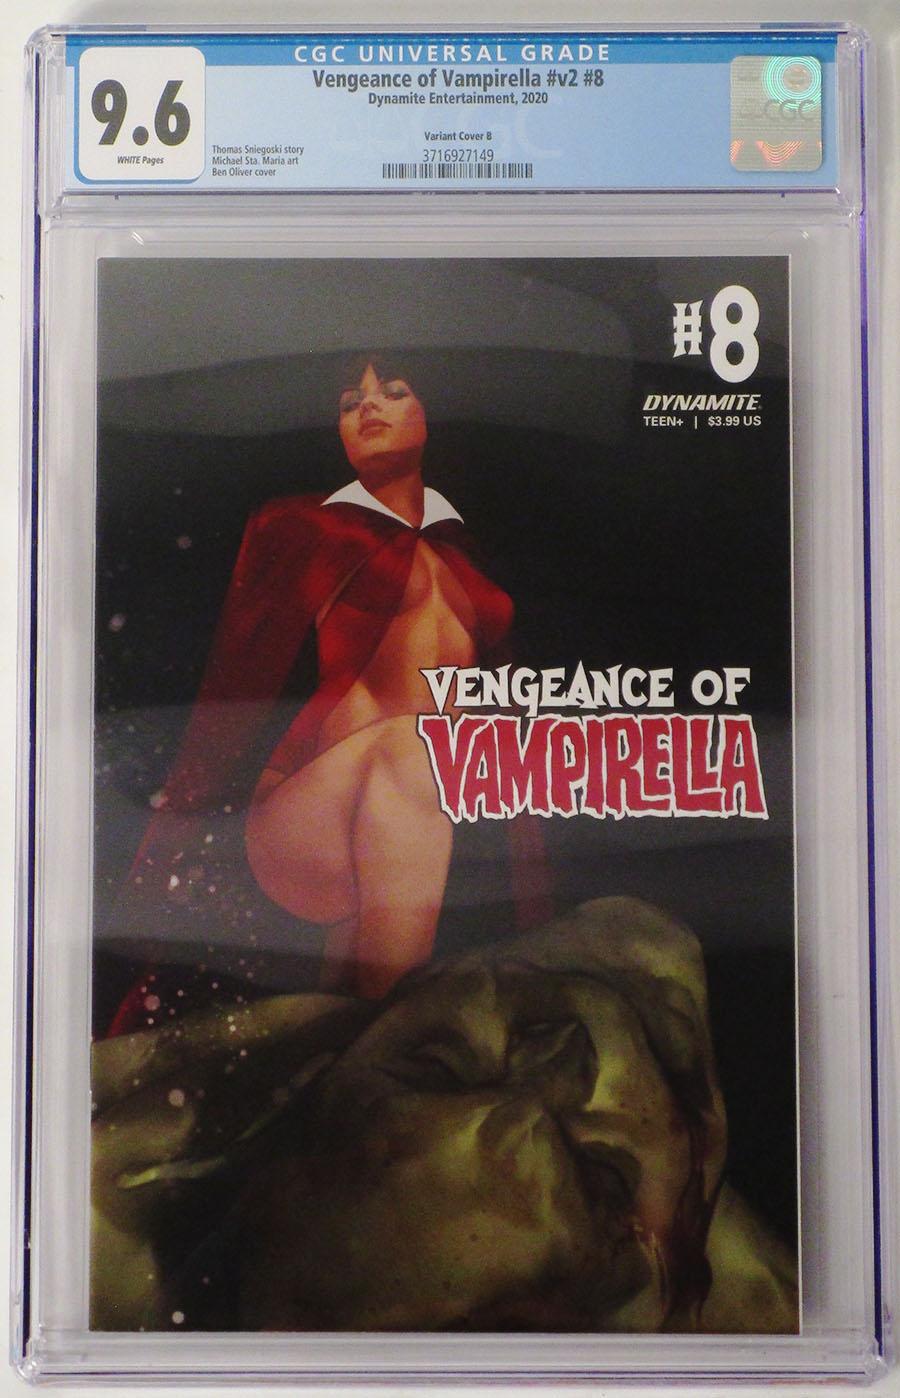 Vengeance Of Vampirella Vol 2 #8 Cover P Variant Ben Oliver Cover CGC Graded